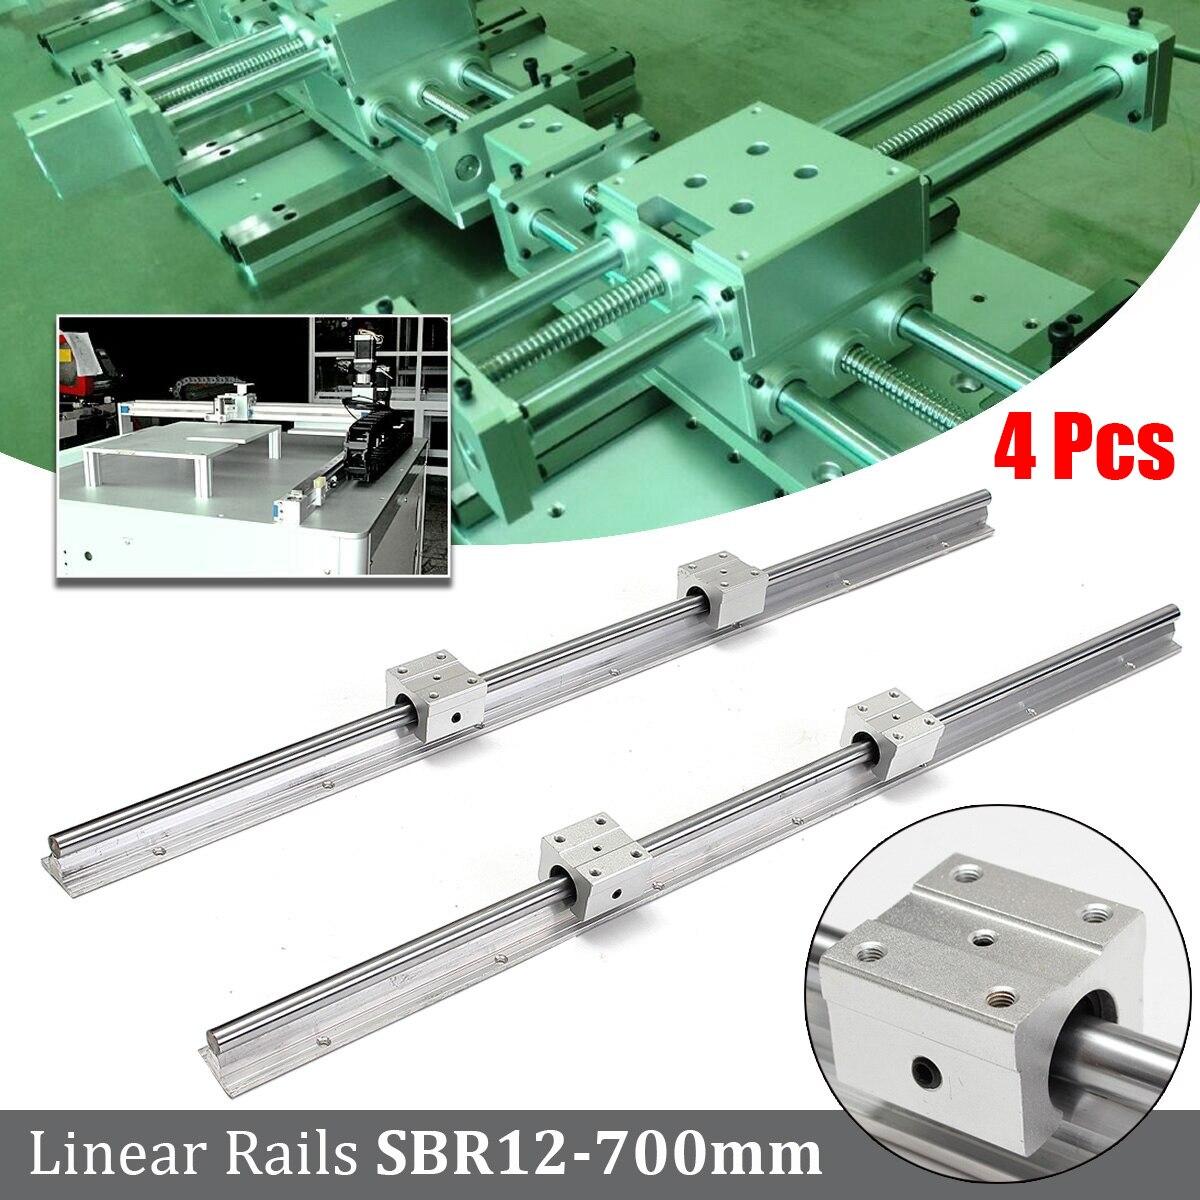 4PCS SBR12-700mm 12MM Linear Bearing Rail Slide Guide Kit Shaft 4X SBR12UU Blocks Linear Guides Set Hardware Length 70cm